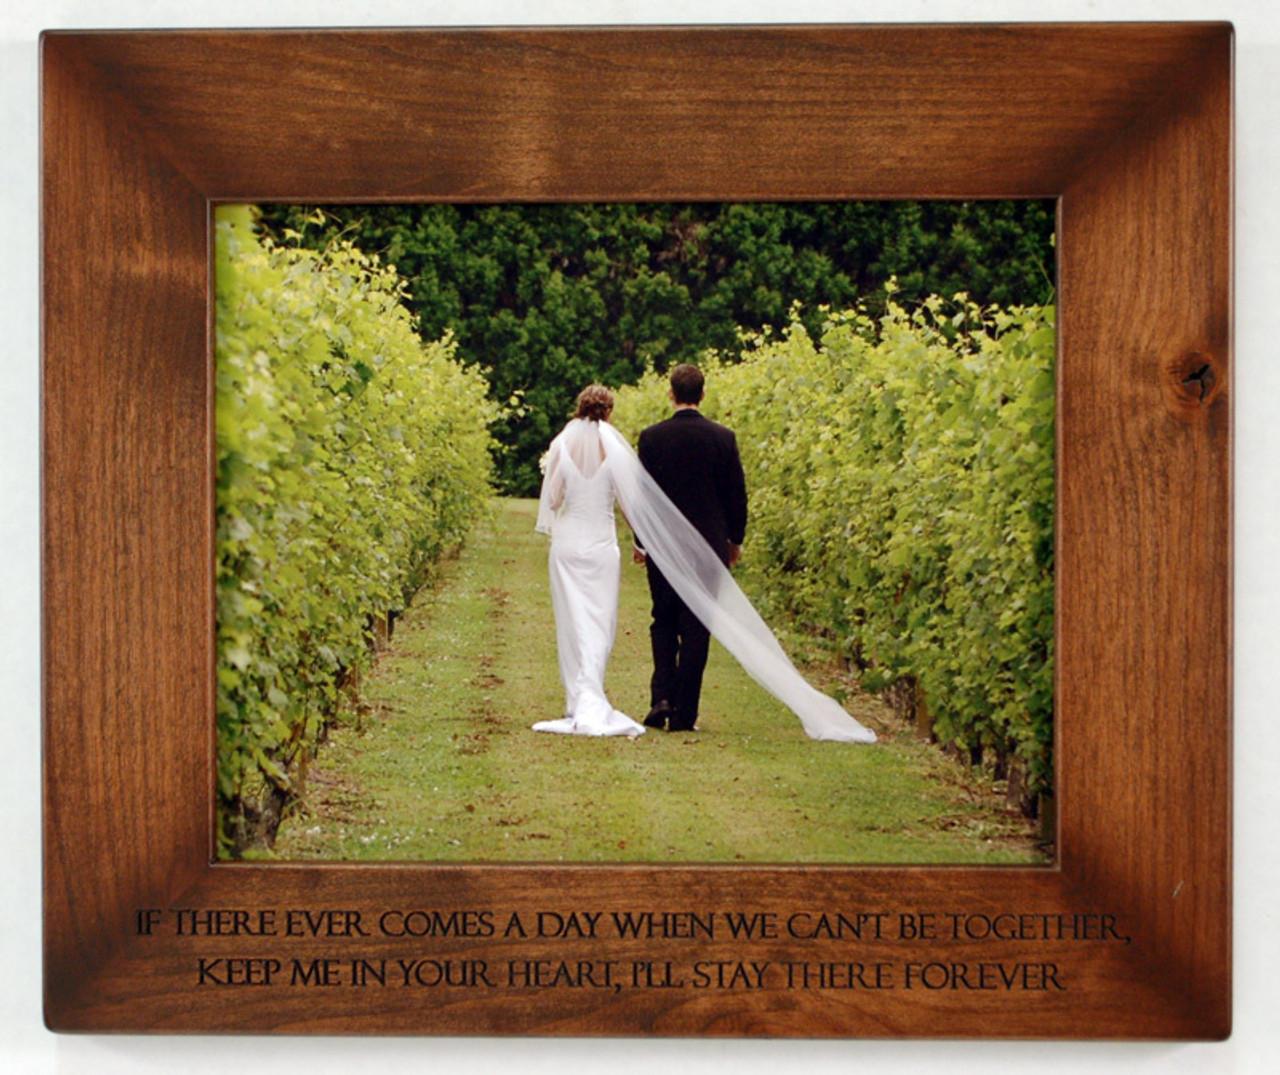 8x10 engraved wood frame